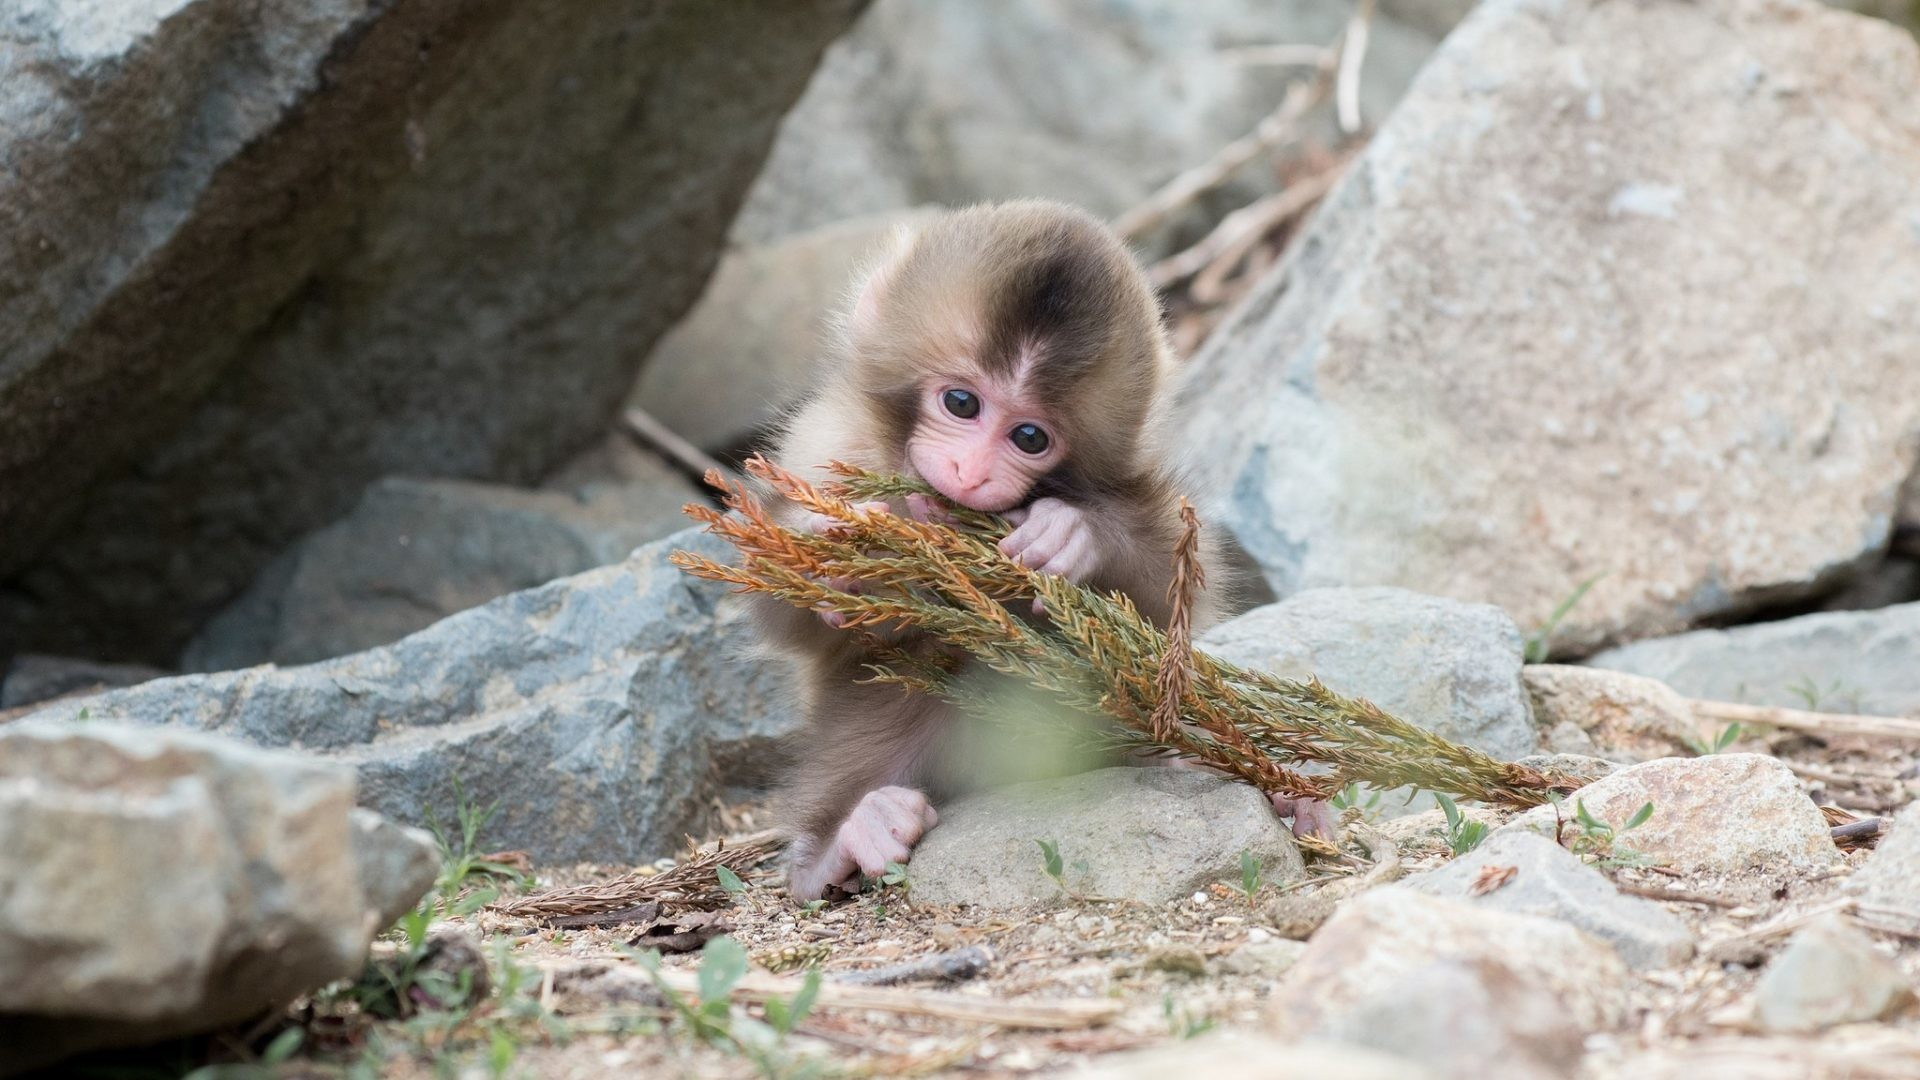 Monkeys Tag – Animals Monkey Ape Stones Monkeys Baby Wild Images for HD 16:9